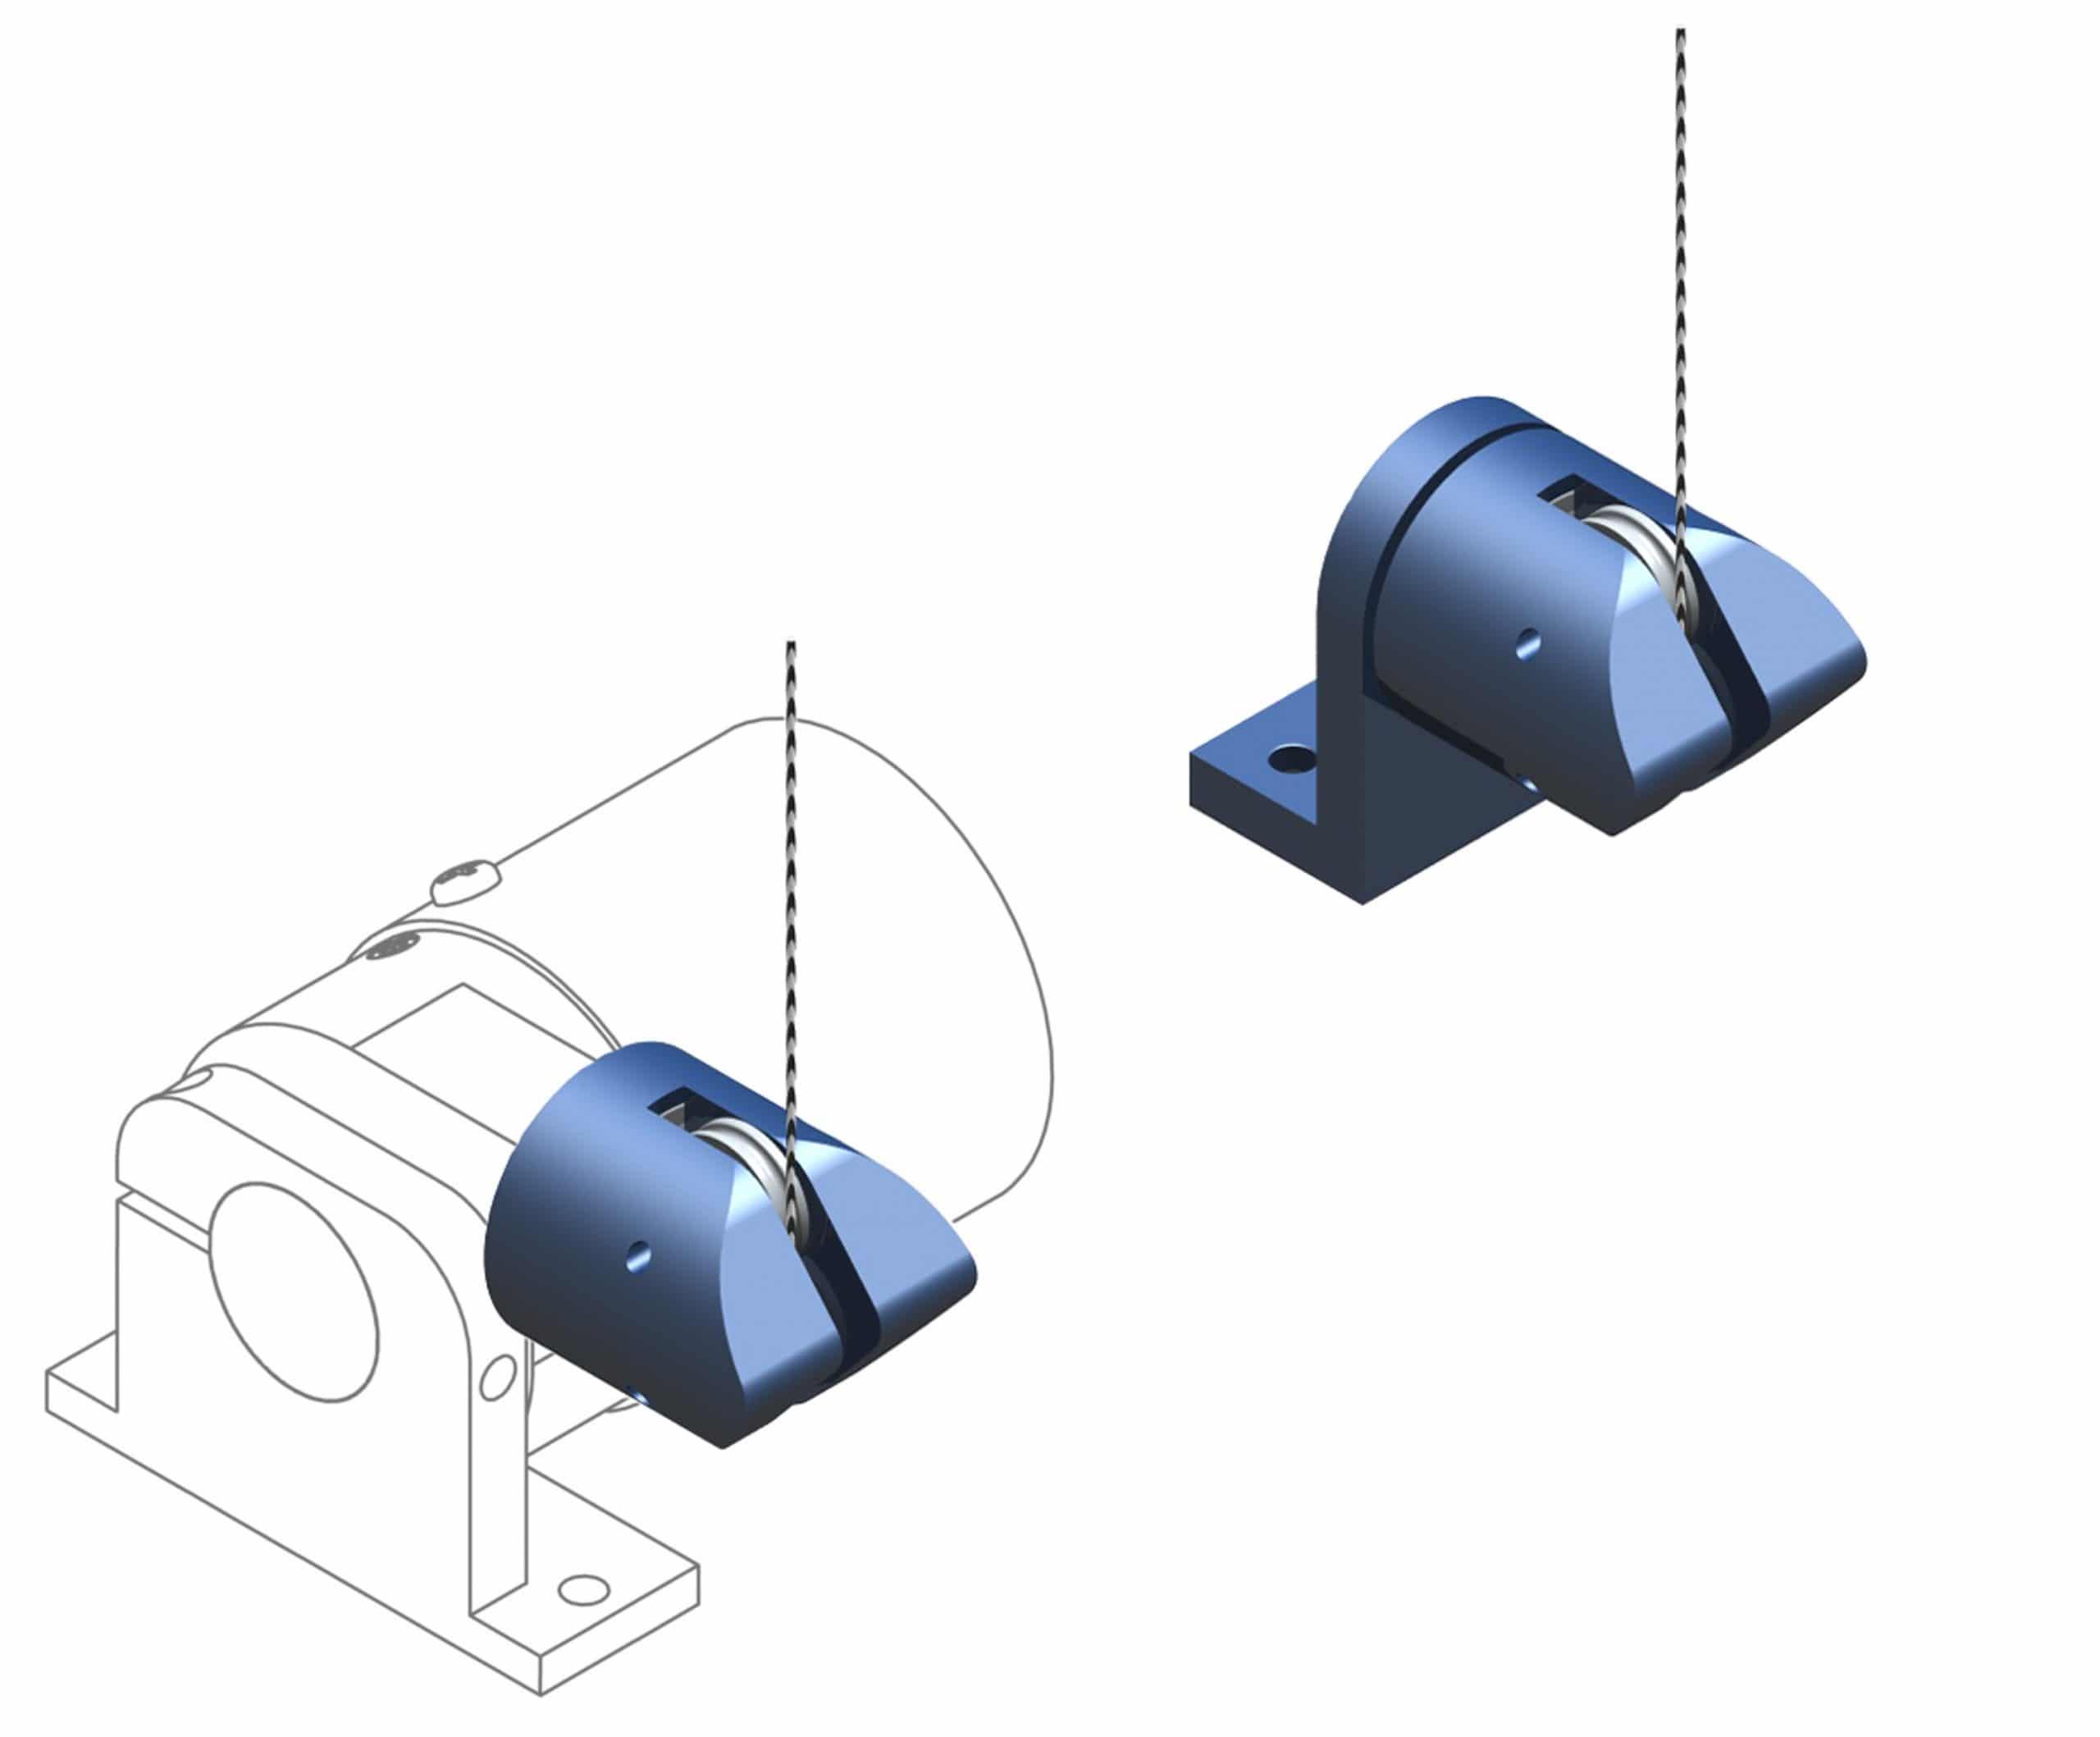 RoundAbout 2D/3D Messseilführung mit Zeichung Seilzugpotentiometer